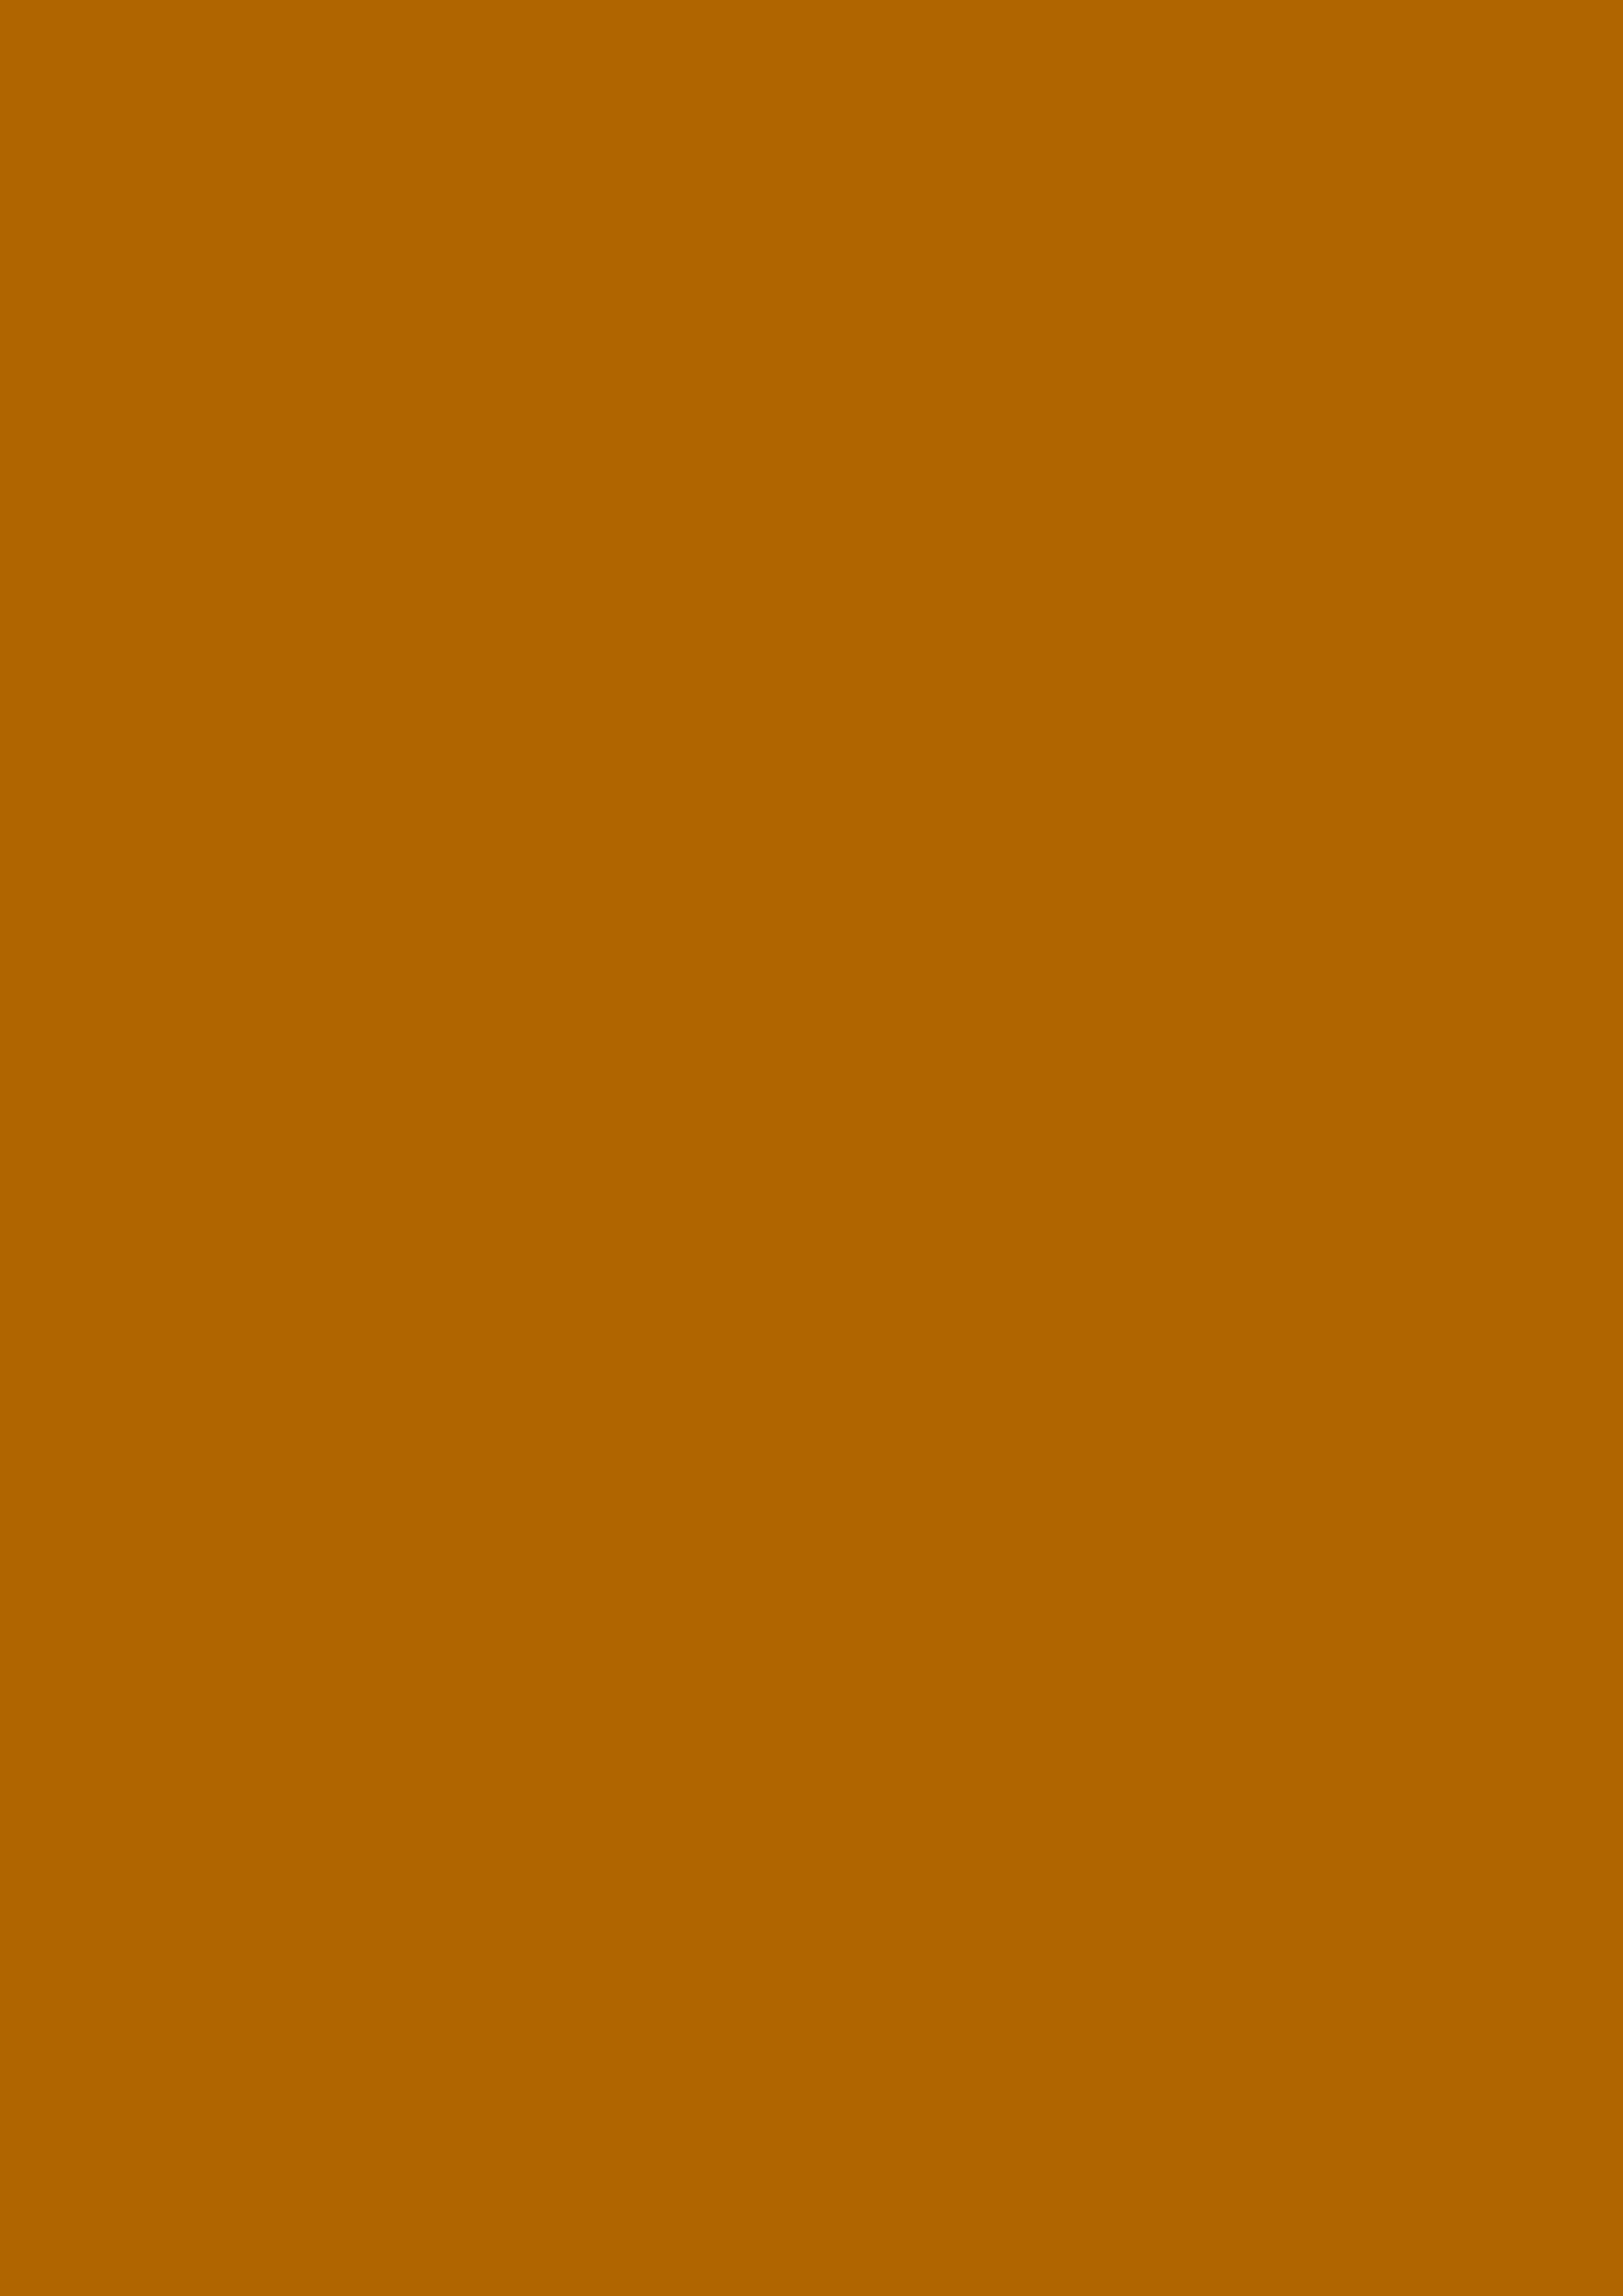 2480x3508 Ginger Solid Color Background